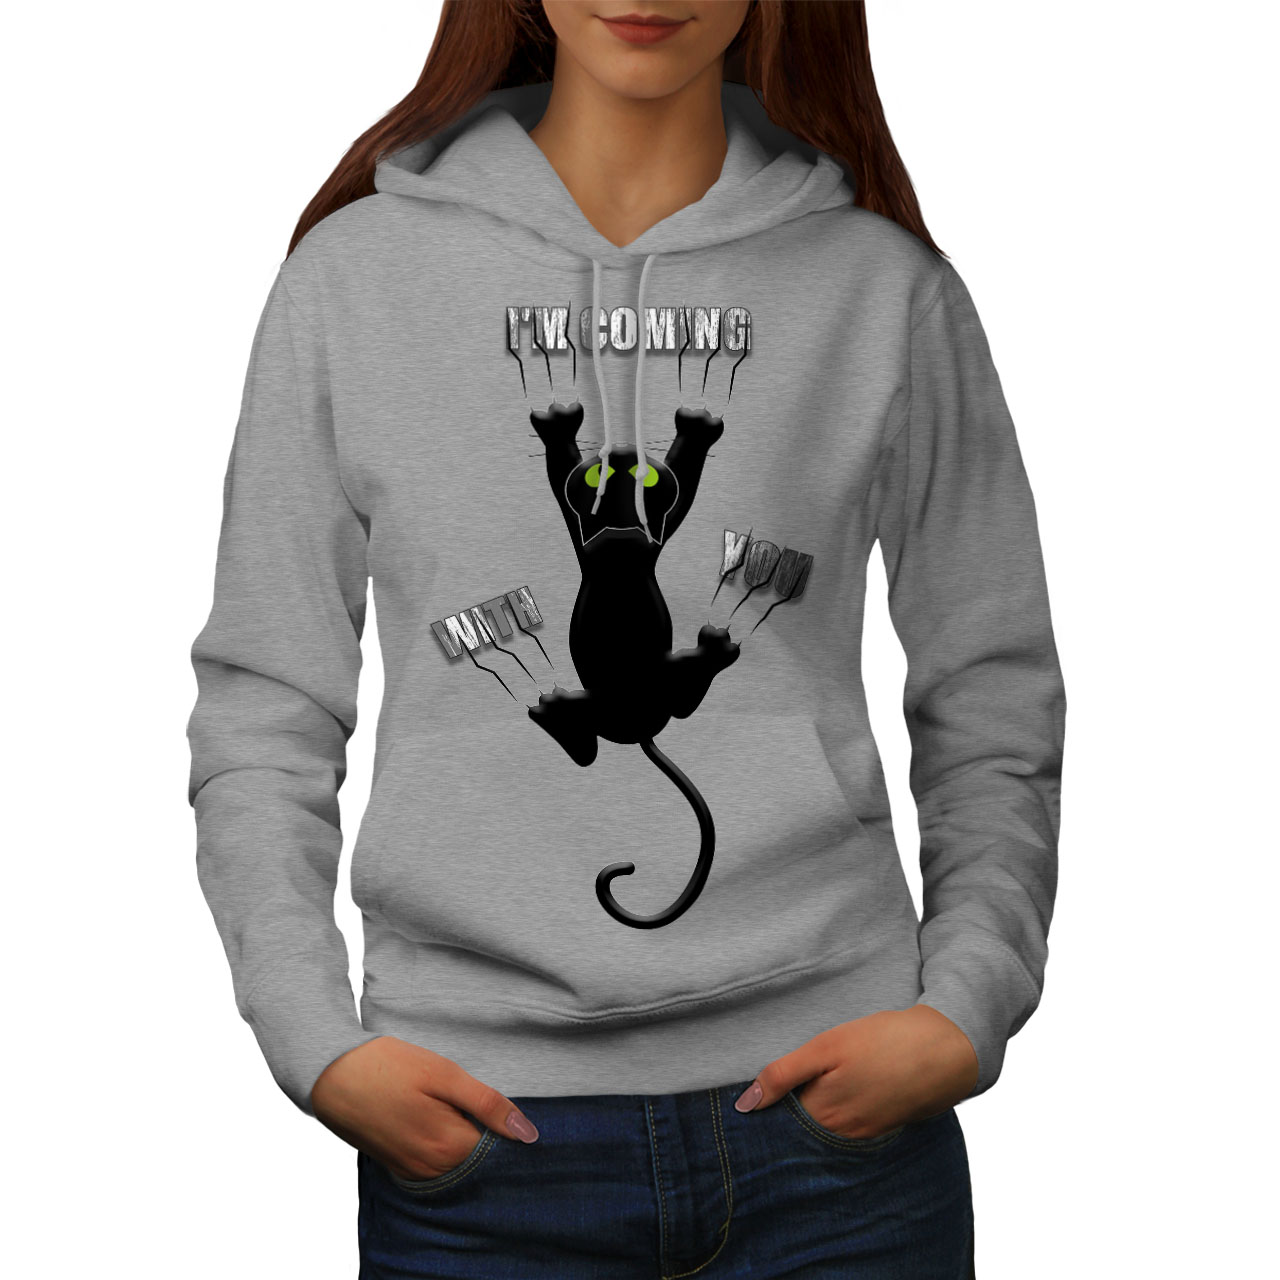 Fun Casual Hooded Sweatshirt Wellcoda Attached Cute Funny Cat Womens Hoodie